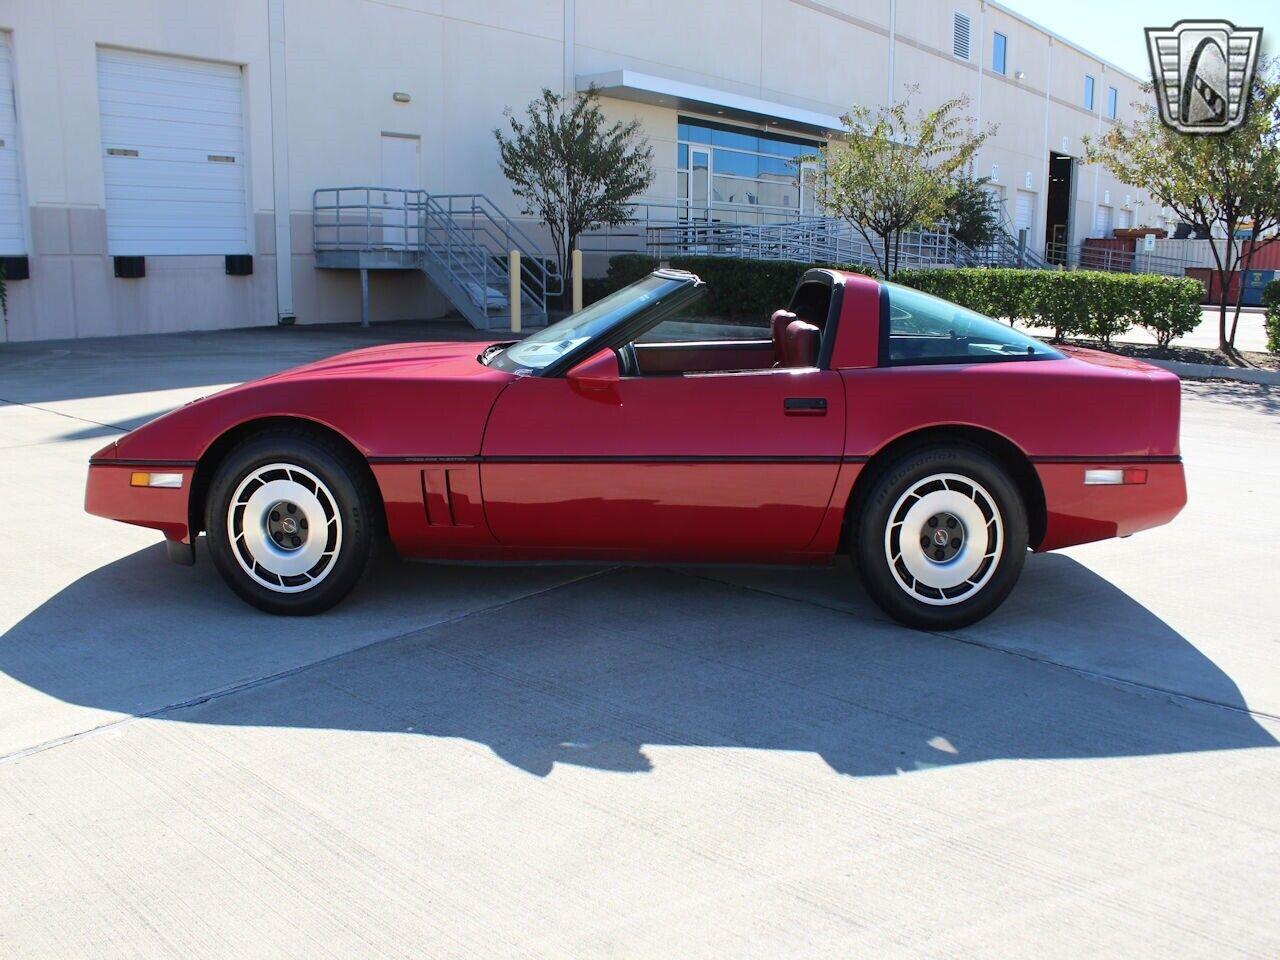 1984 Red Chevrolet Corvette     C4 Corvette Photo 4